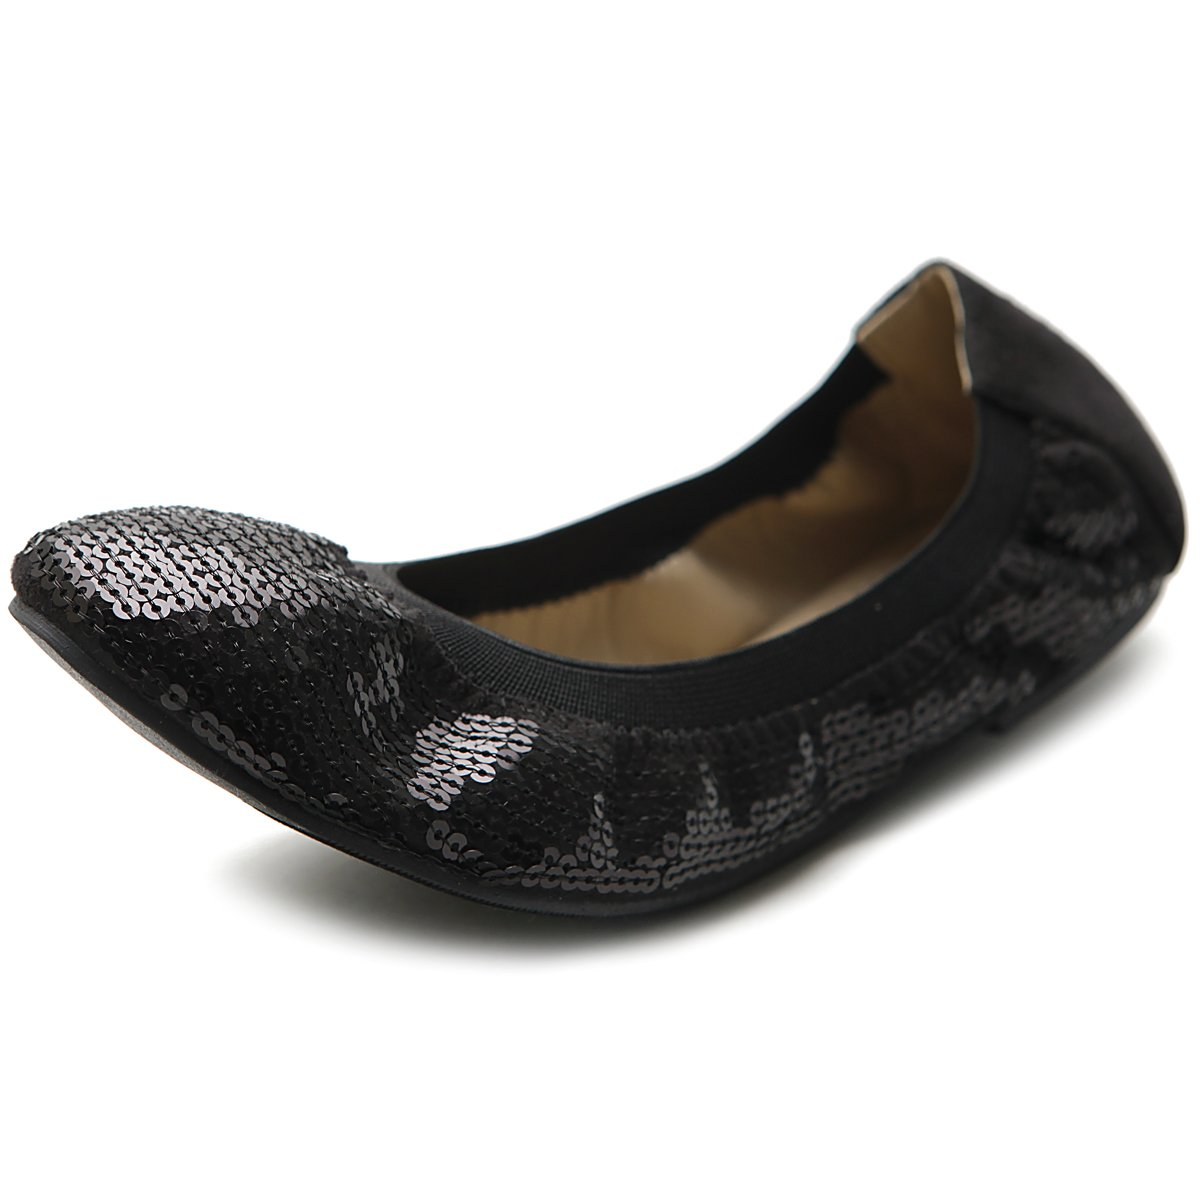 Ollio Women's Shoe Ballet Multi Color Spangle Comfort Flat ZM1057(9 B(M) US, Black)